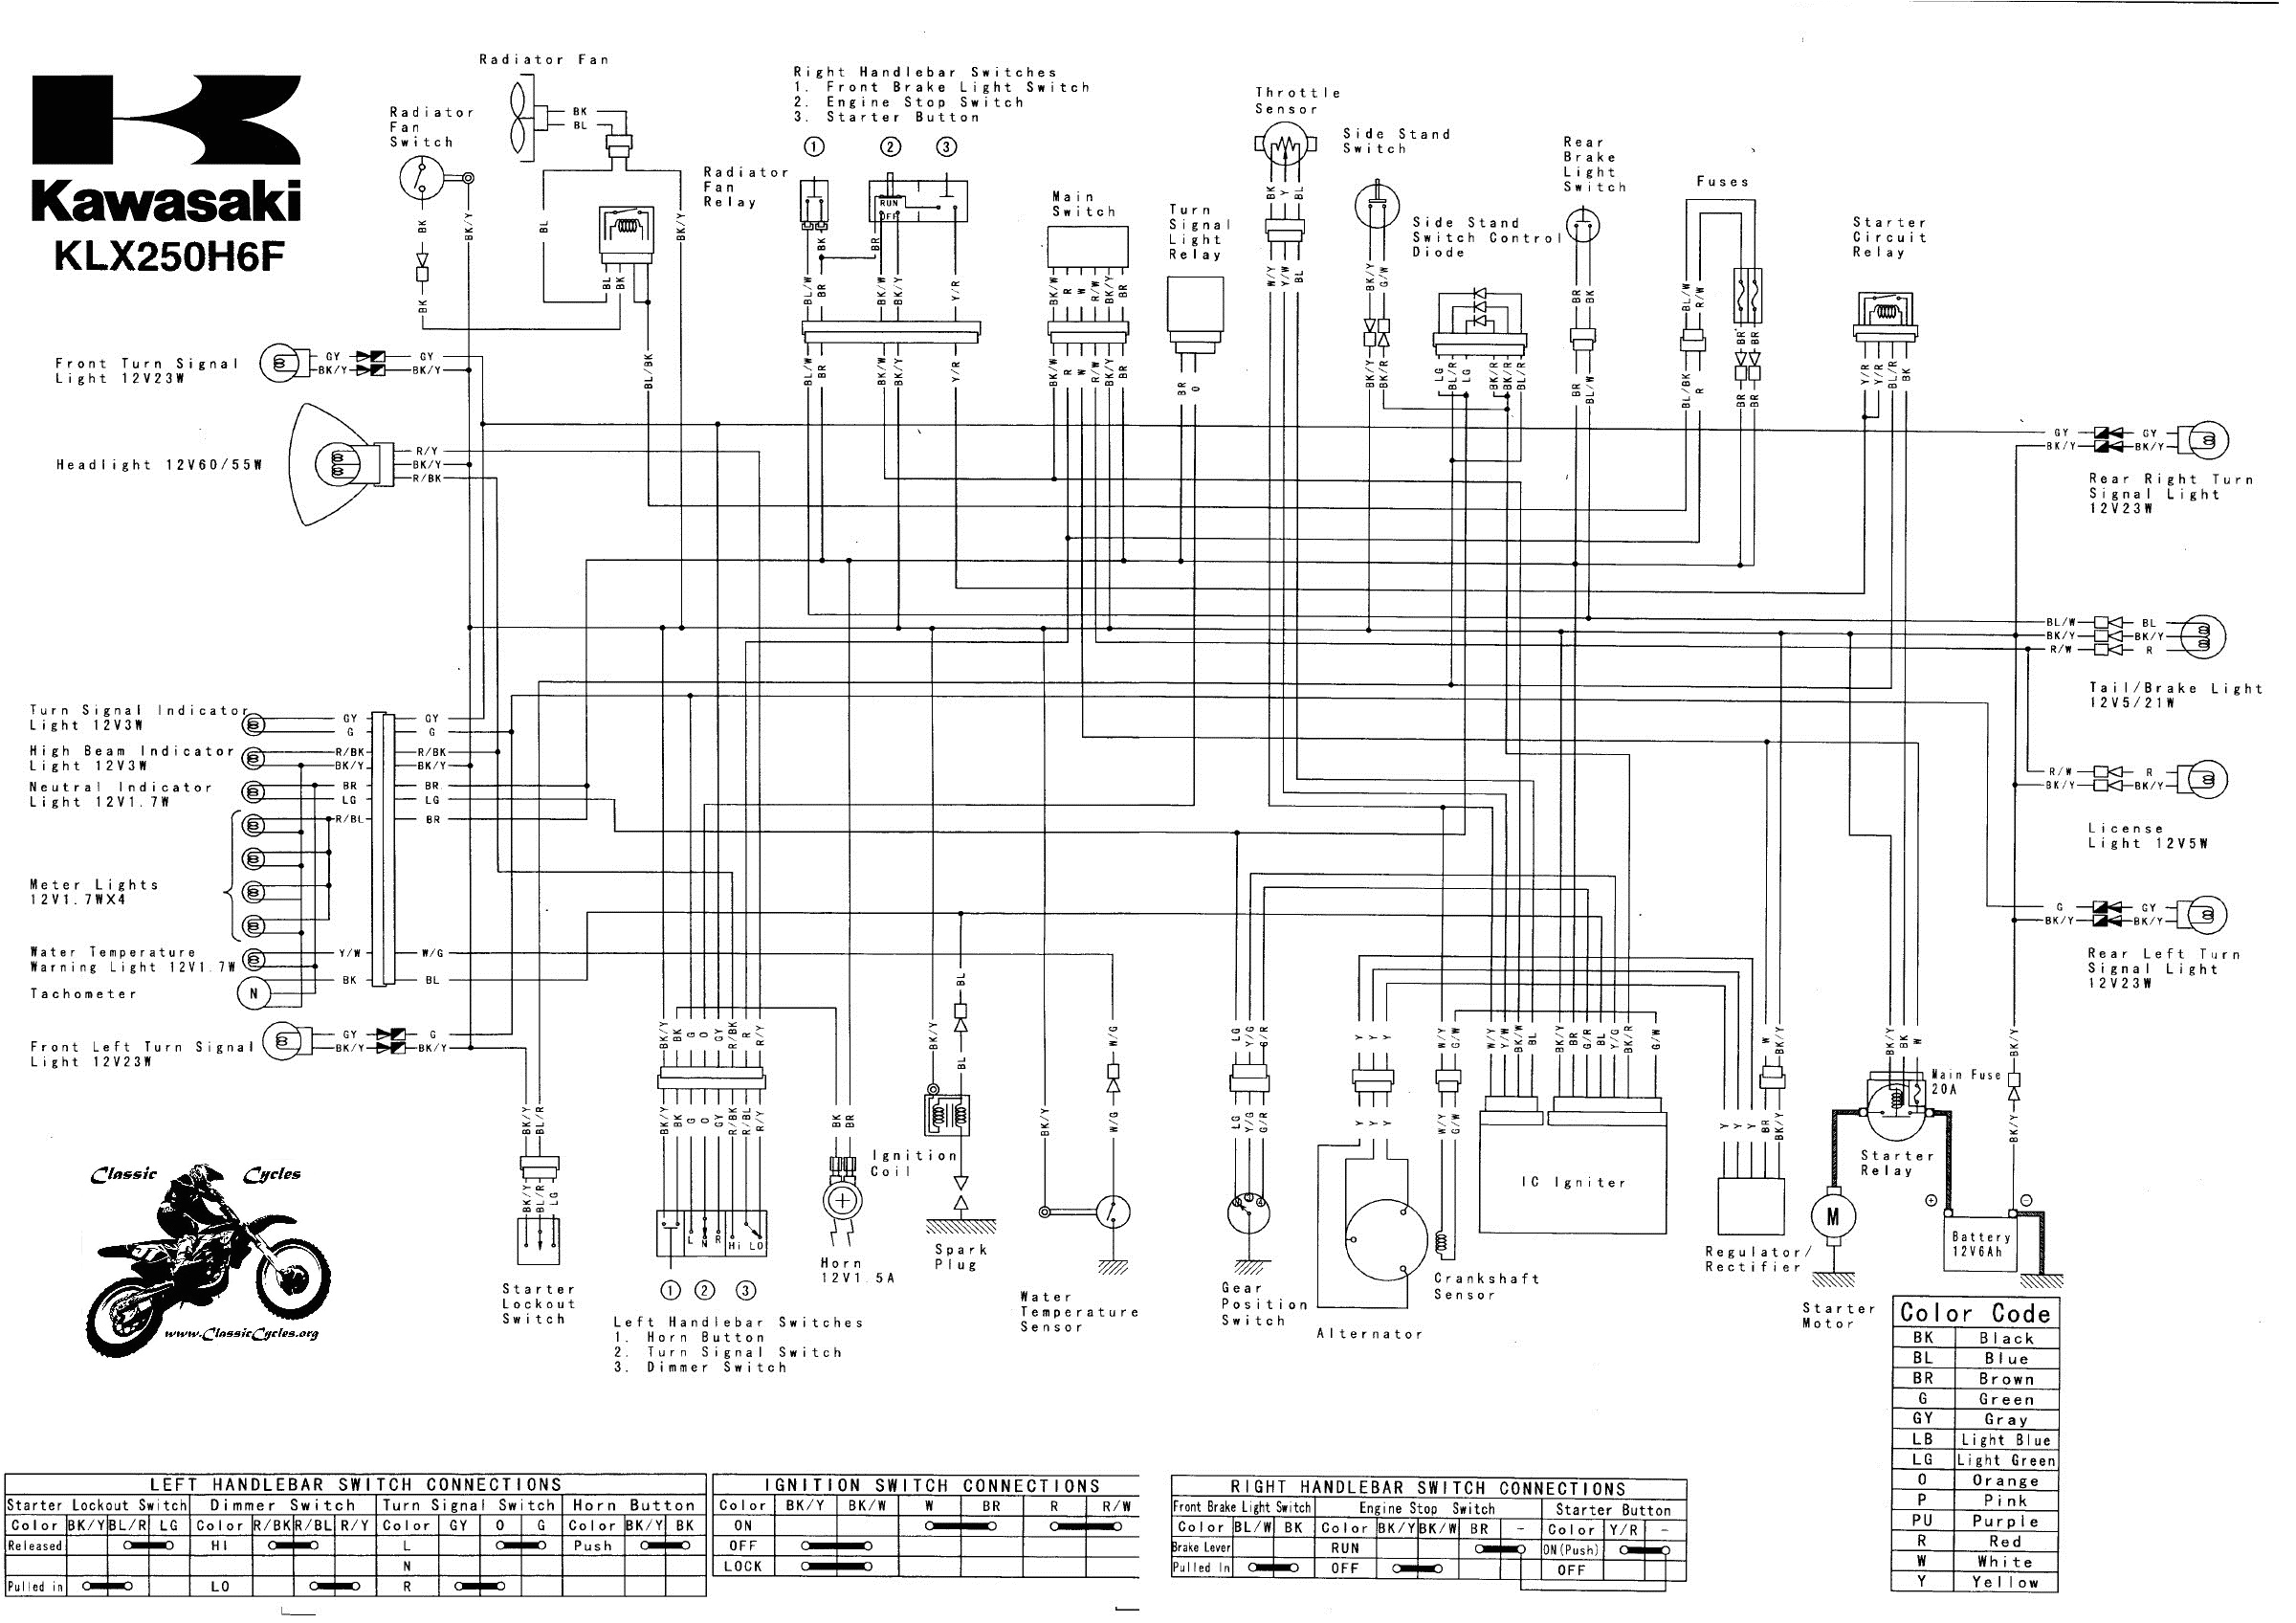 kawasaki en500 wiring diagram wiring diagram post vulcan 500 wiring diagram kawasaki motorcycle wiring diagrams kawasaki